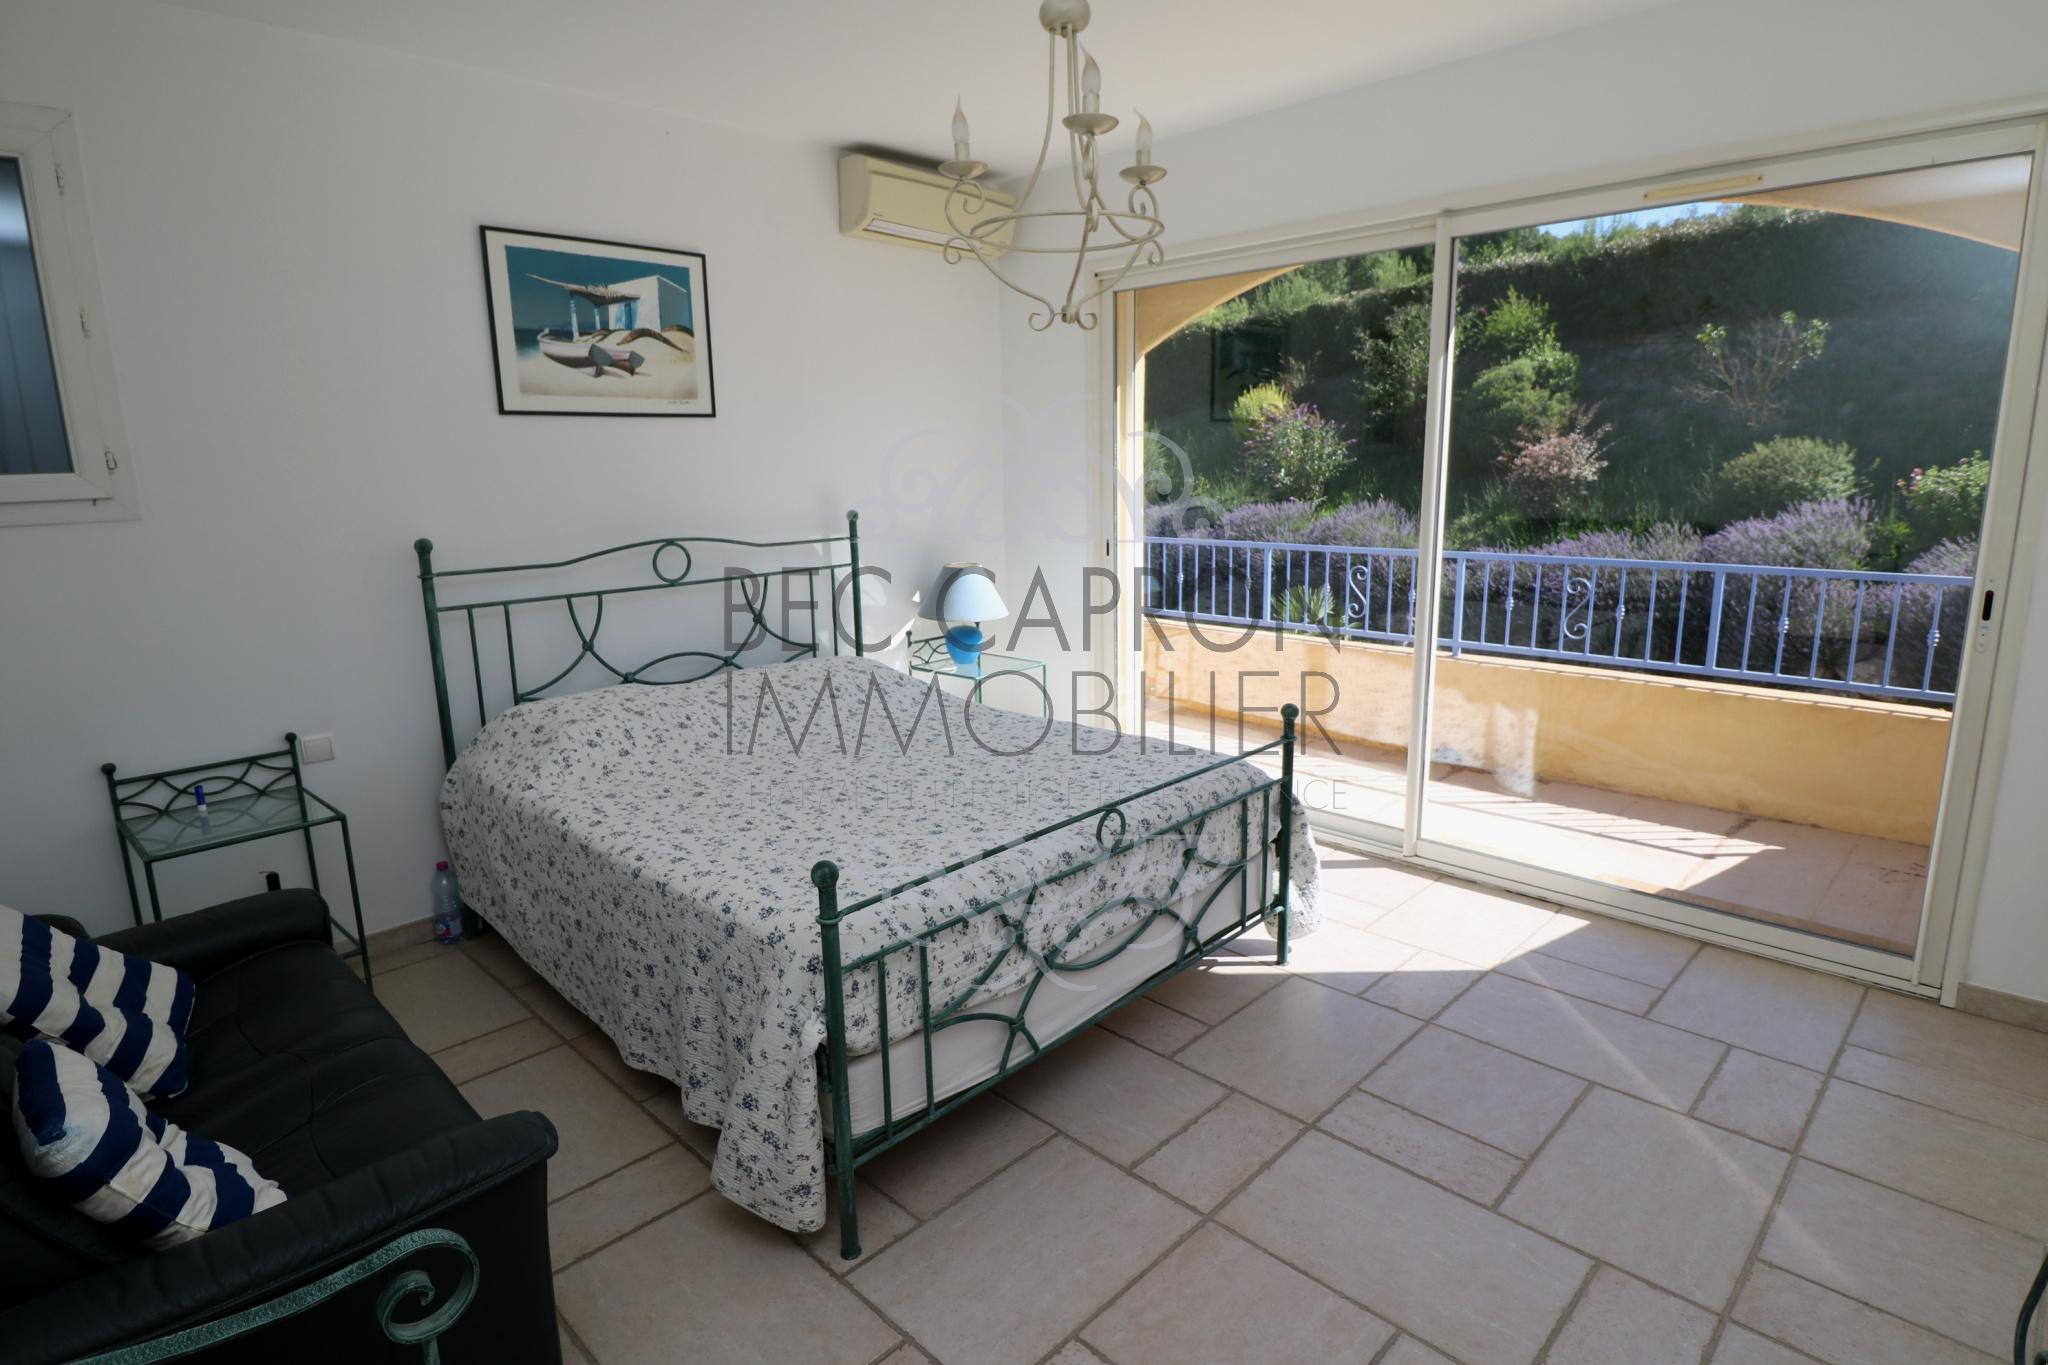 Chambre et sa terrasse